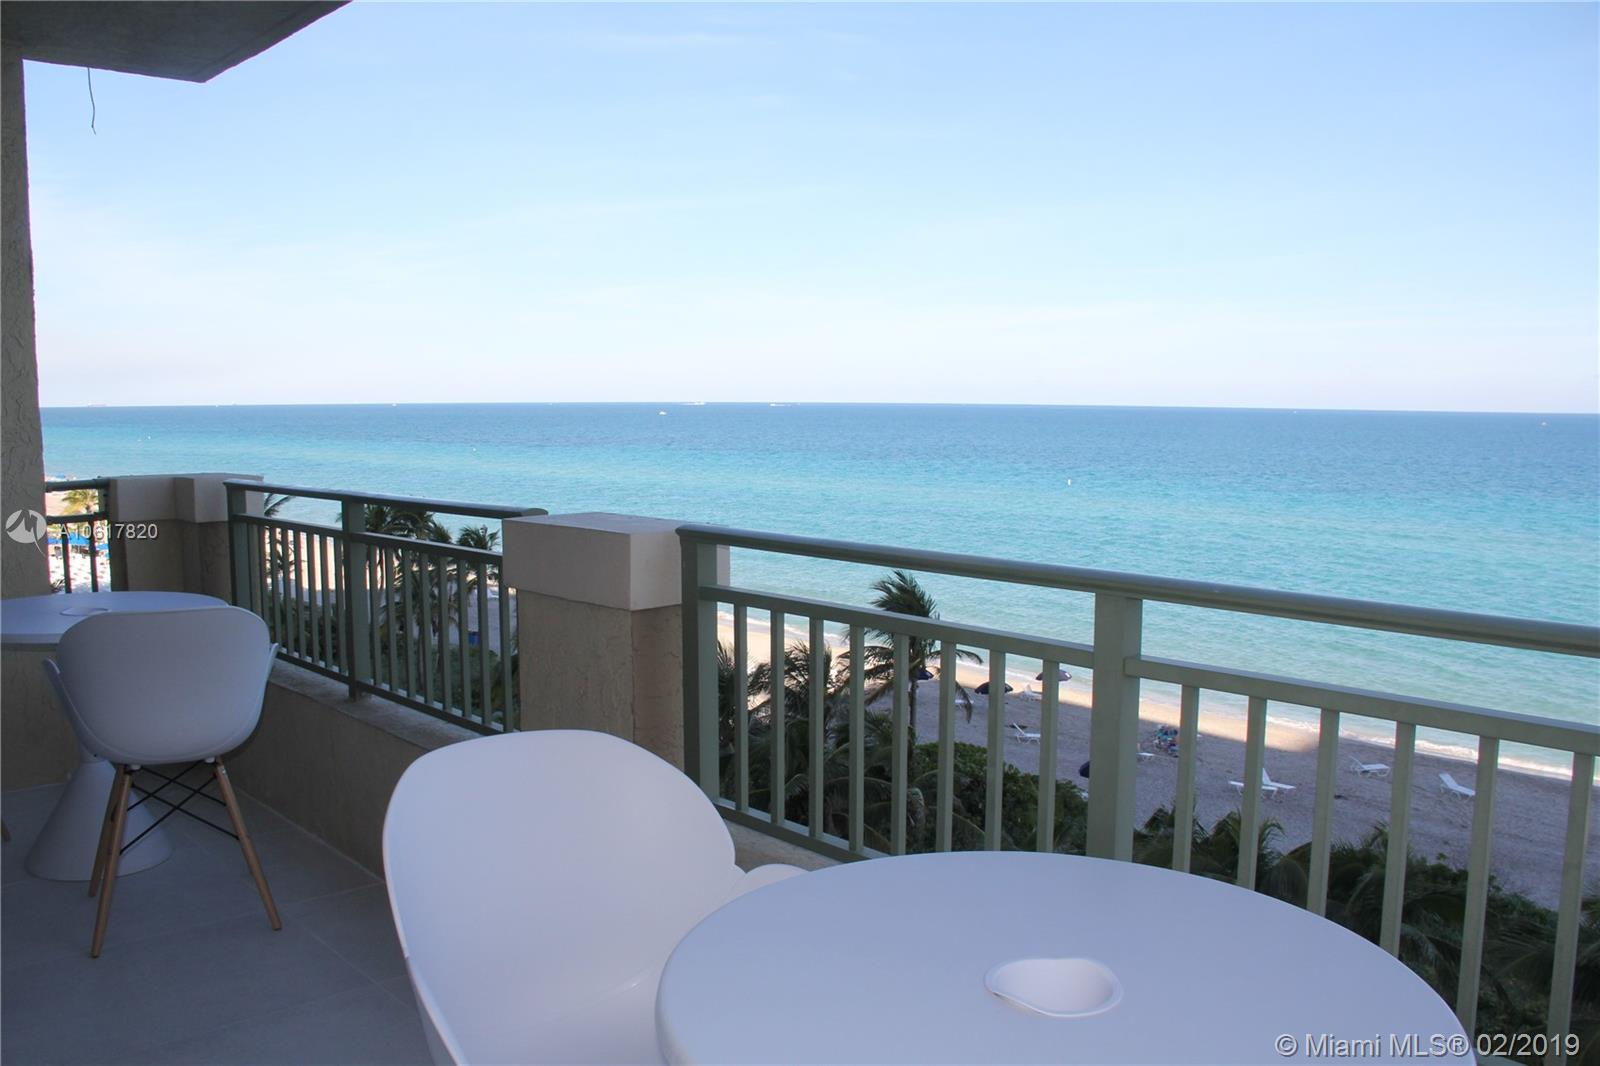 2080 Hallandale #511 - 2080 S Ocean Dr #511, Hallandale Beach, FL 33009